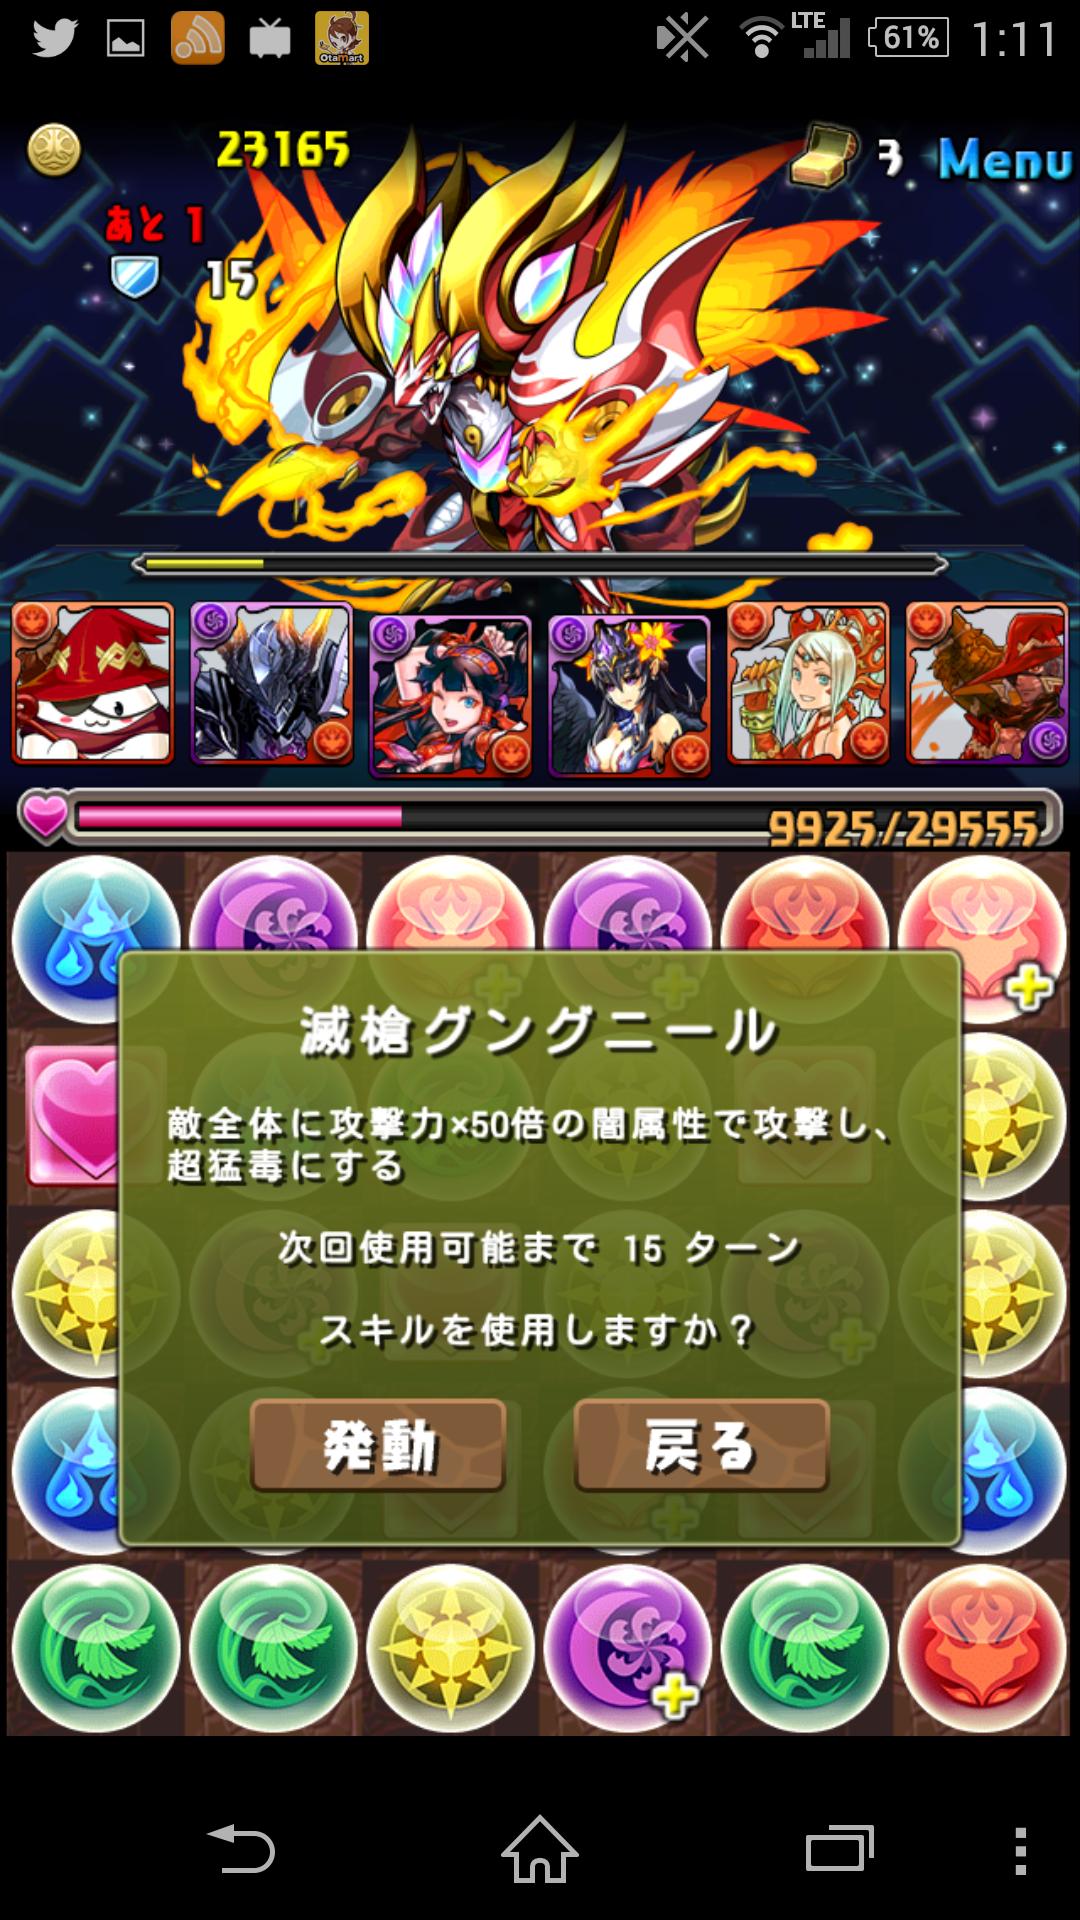 Screenshot_2015-03-18-01-11-08.png